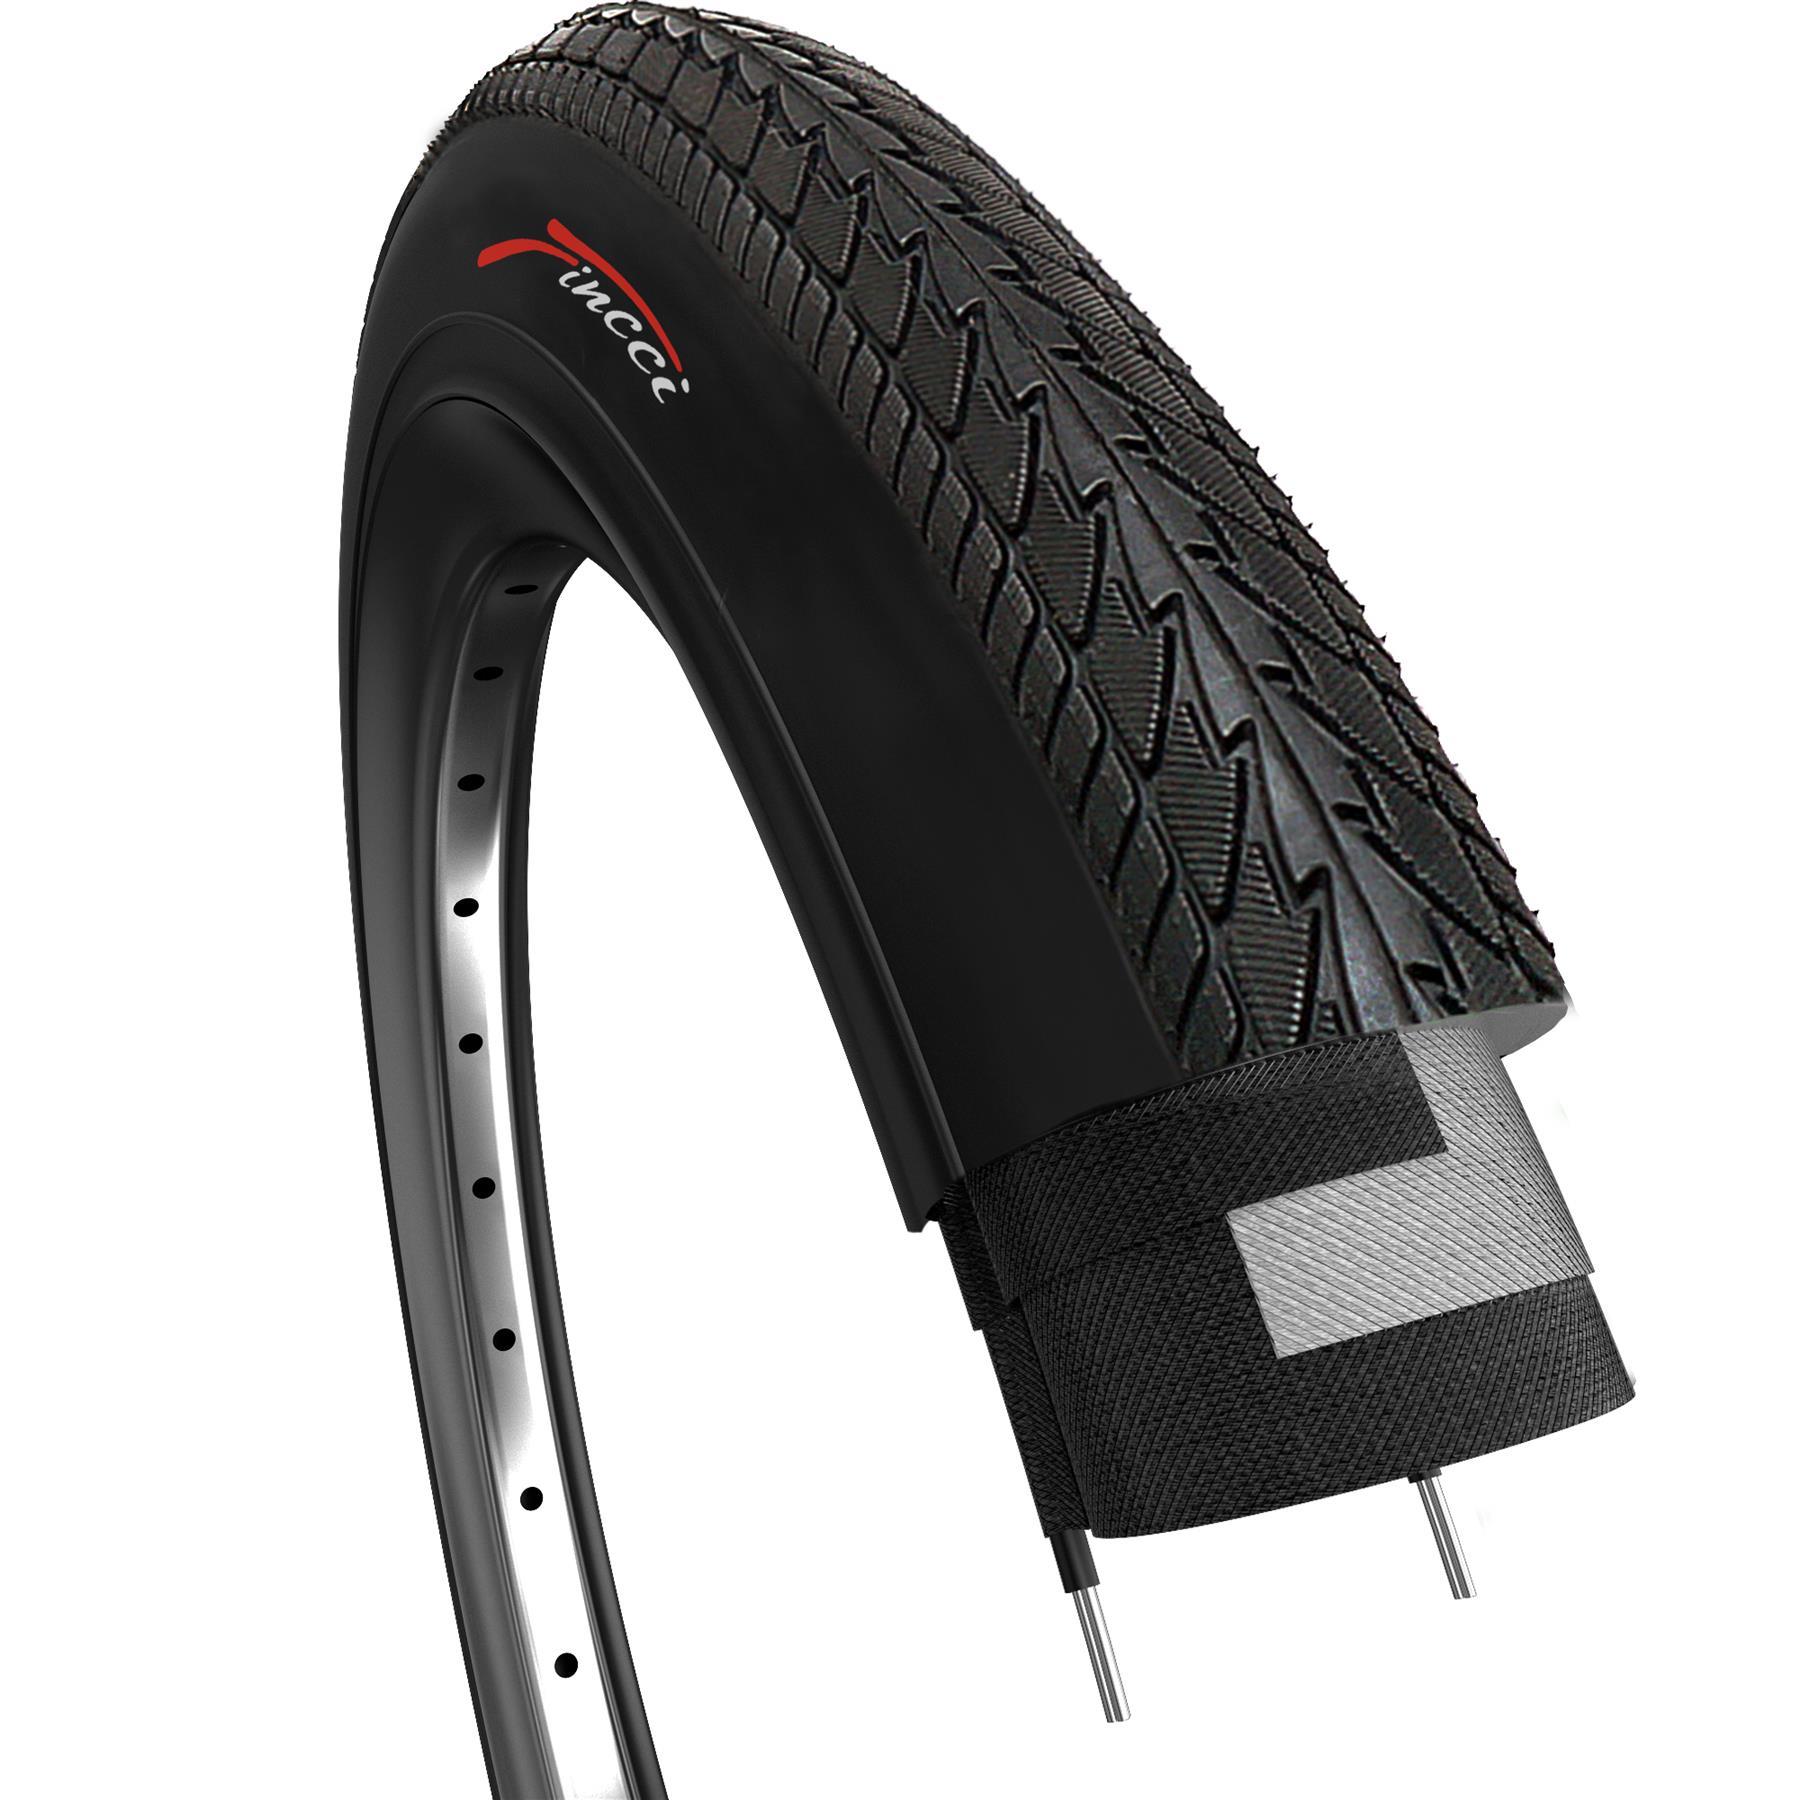 "2 x Fincci 26/"" x 1.50/"" Slick Road Mountain Hybrid Bike Bicycle Tyres Pair"